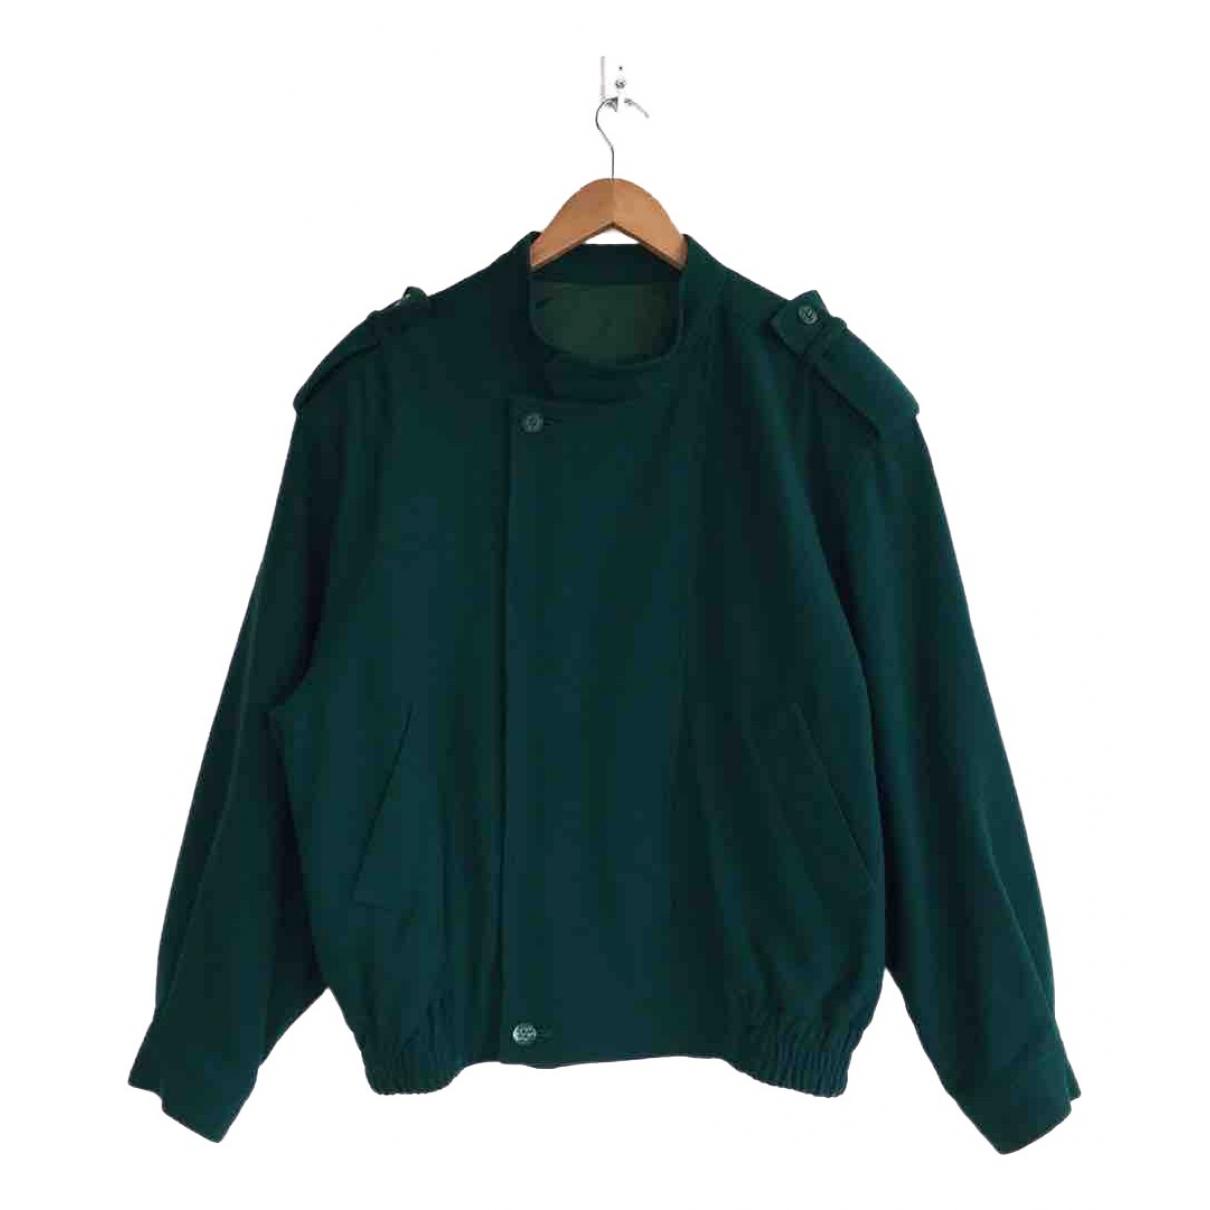 Balenciaga \N Jacke in  Gruen Wolle